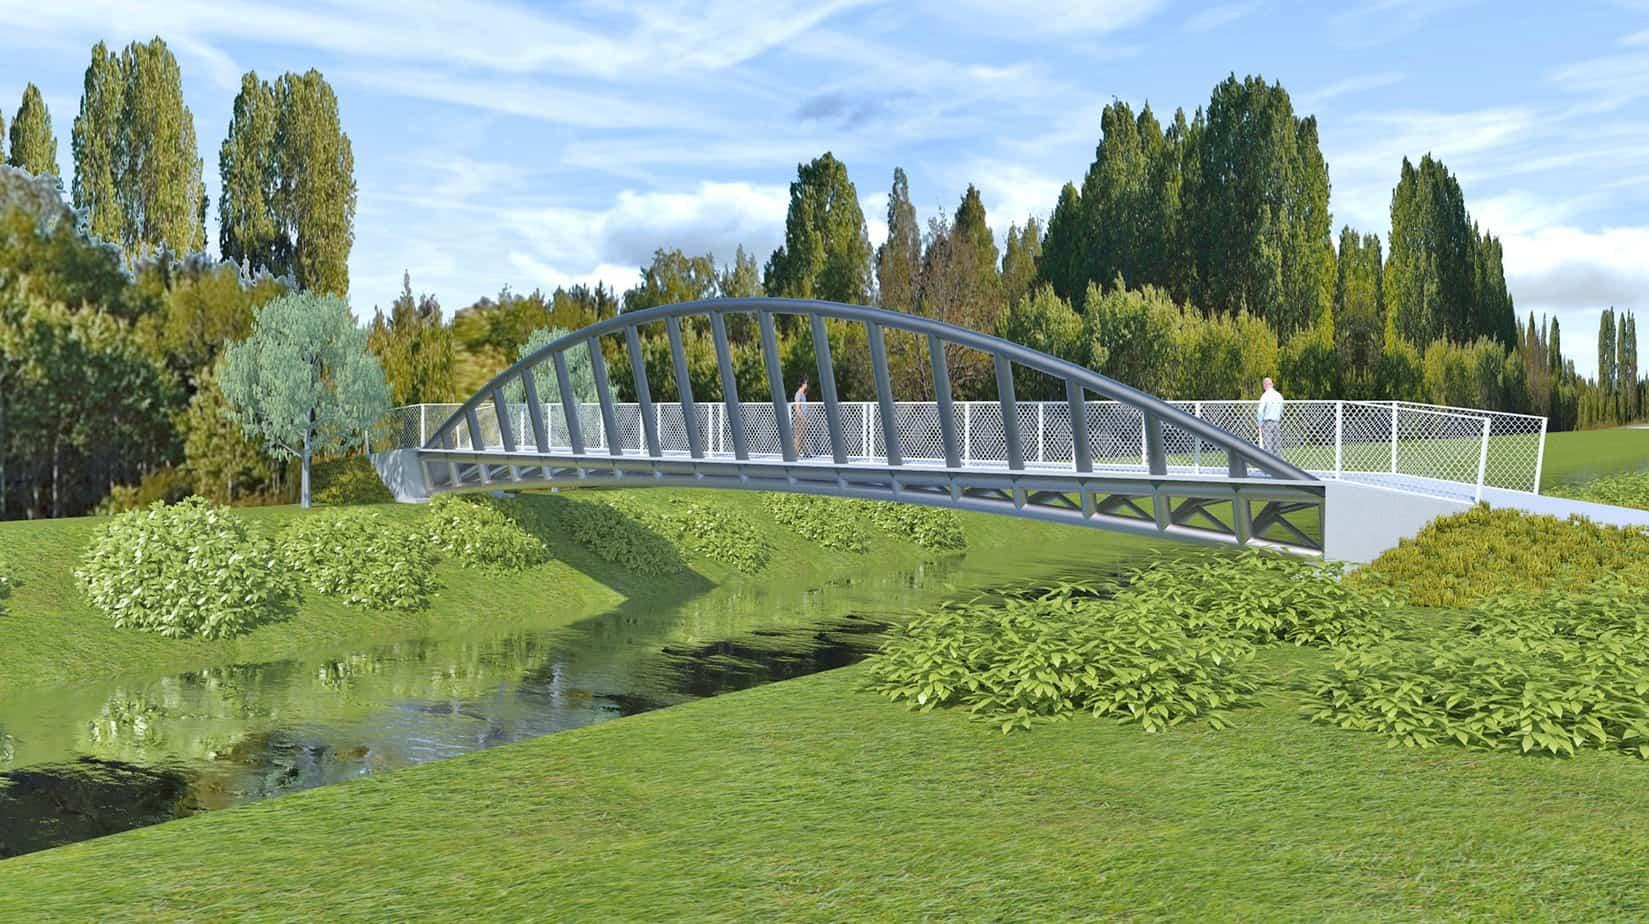 Un rendering del ponte pedonale ad arco